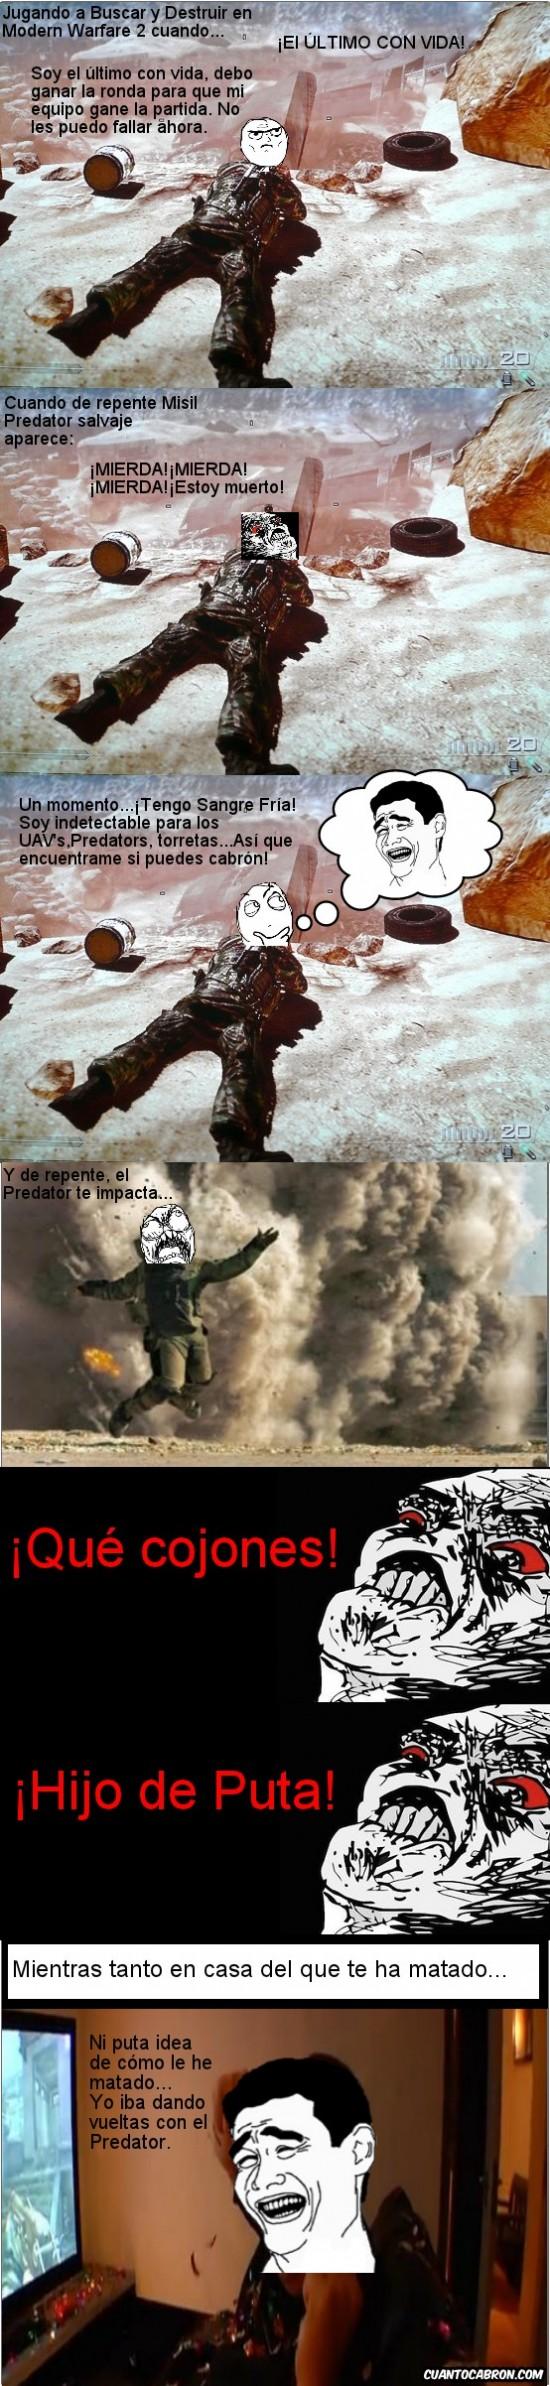 Afganistán,Call Of Duty,Camper,En Tierra Hostil,guiris,Misil Predator,Modern Warfare 2,Sangre Fría,suele pasar,yaoming